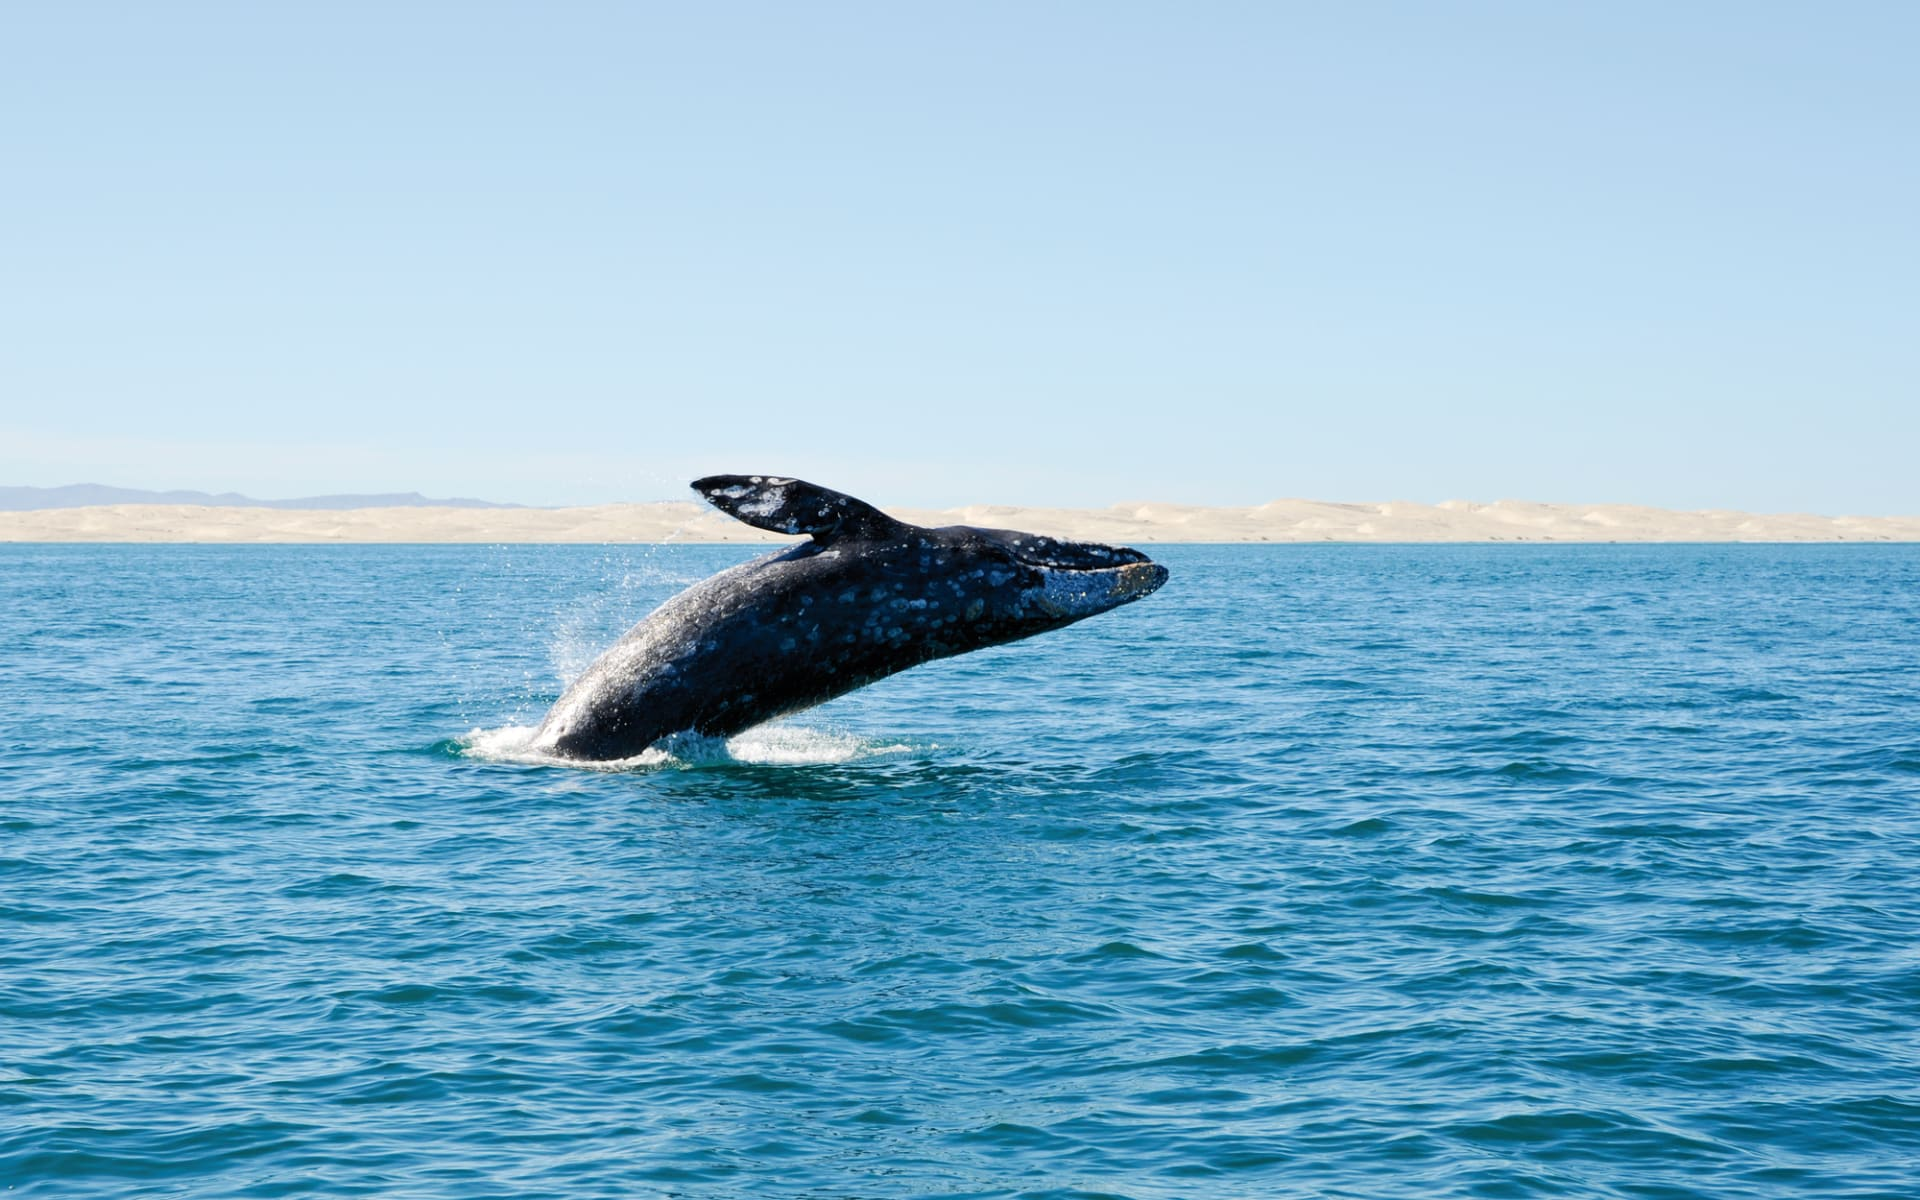 Höhepunkte Baja California ab La Paz: Mexico - Baja California - Grauwal